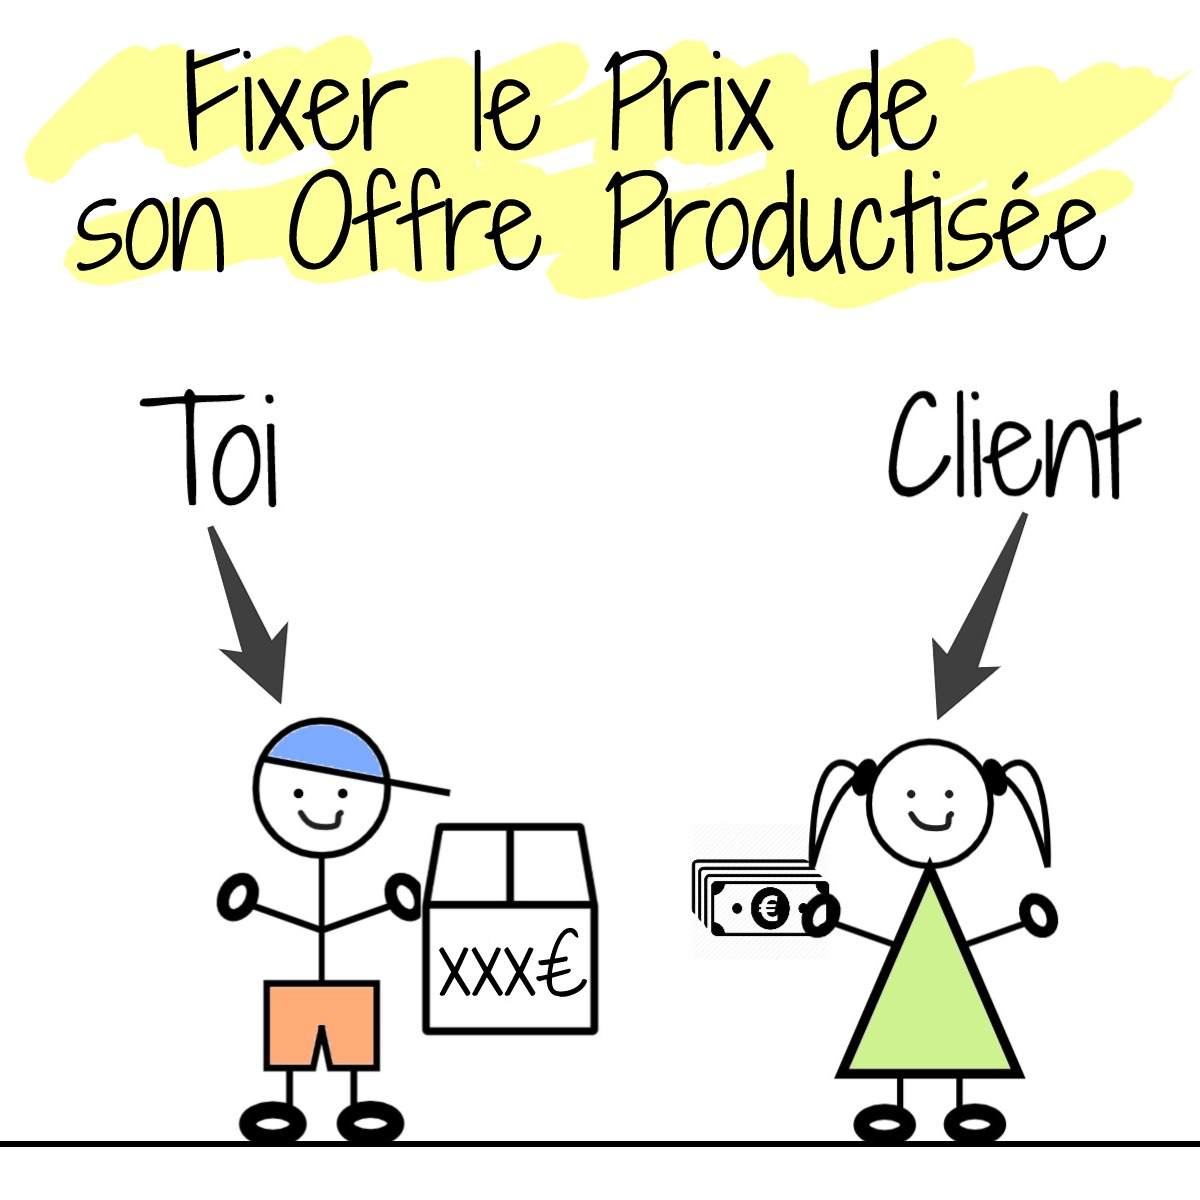 fixer prix offre service freelance